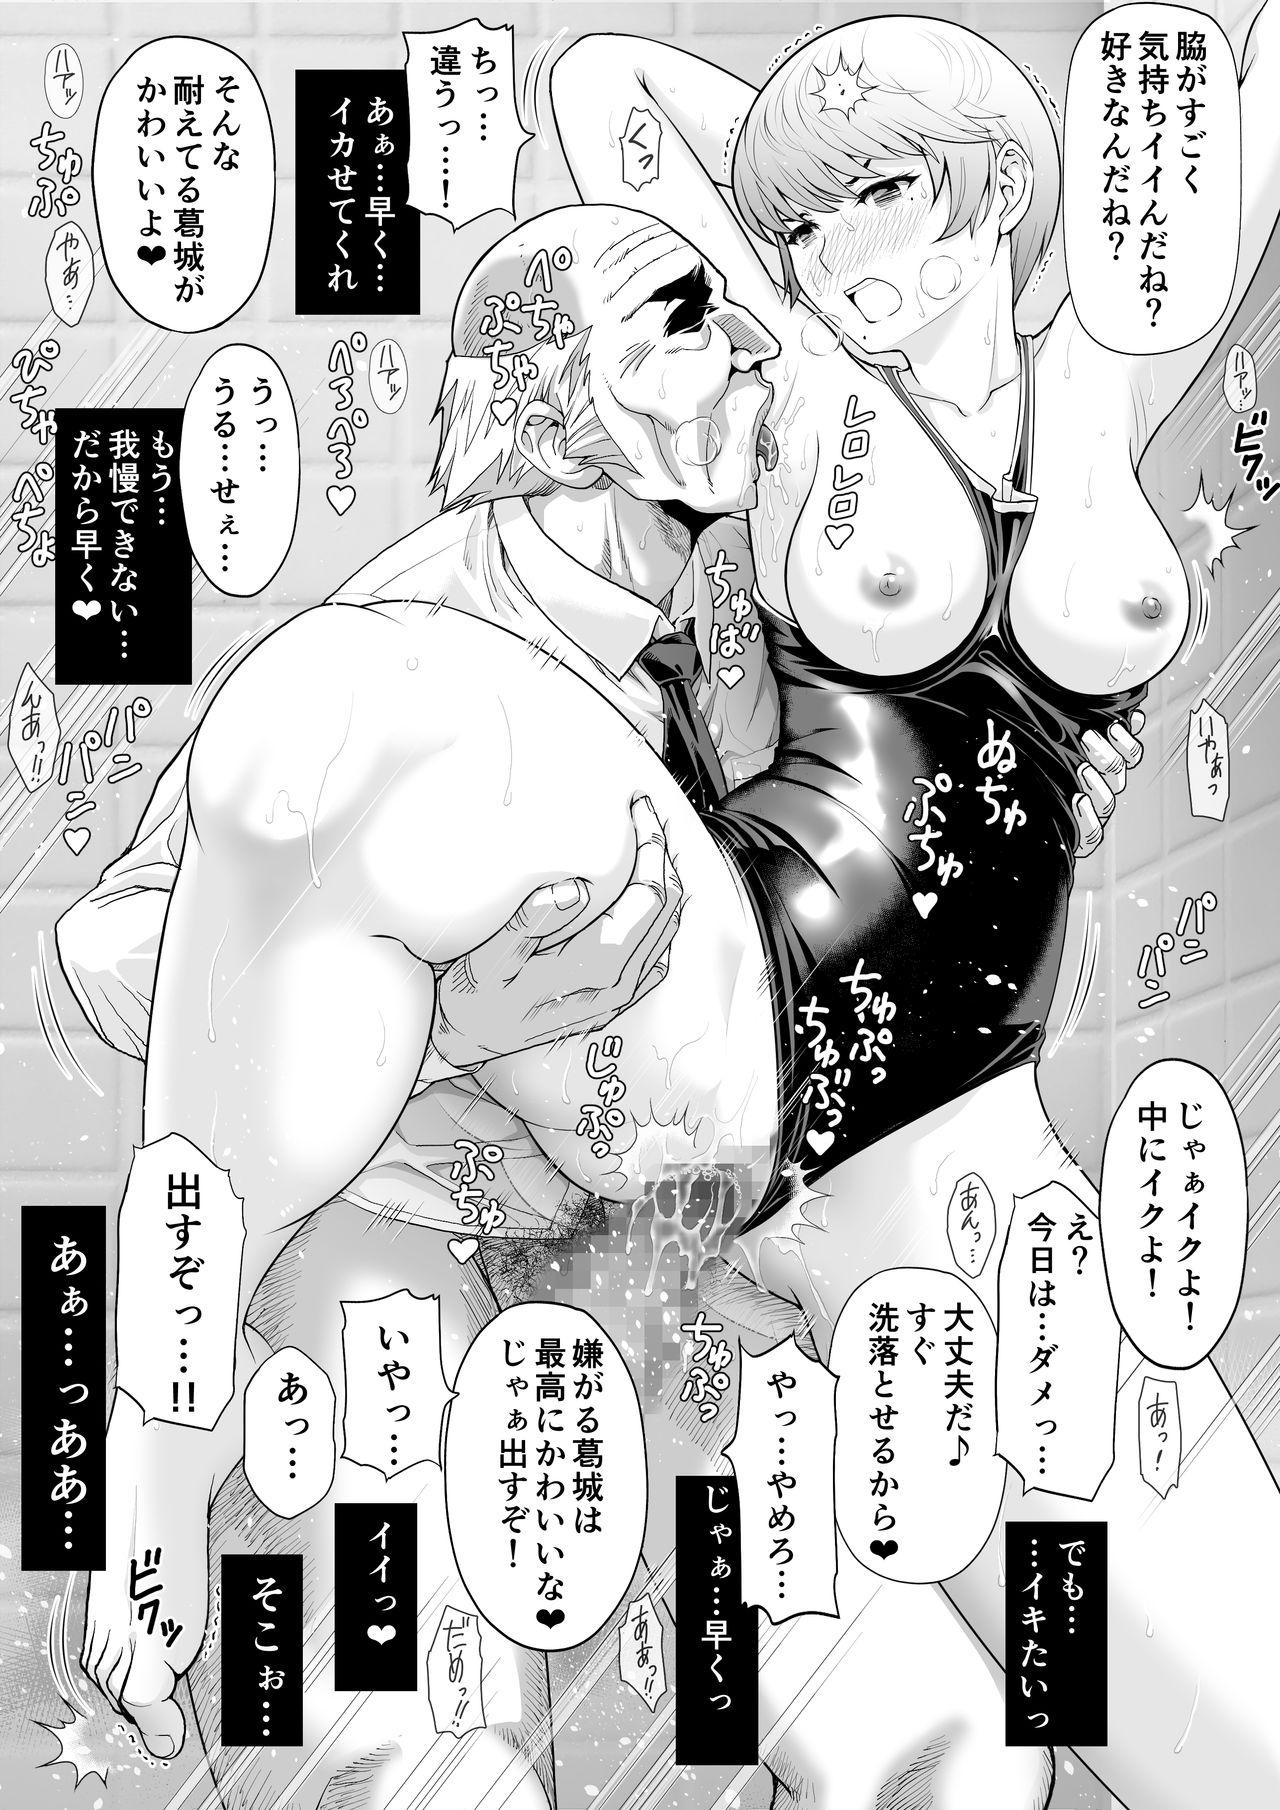 Namaiki mmusume ni tsuyo ● ikīki jugyō 59